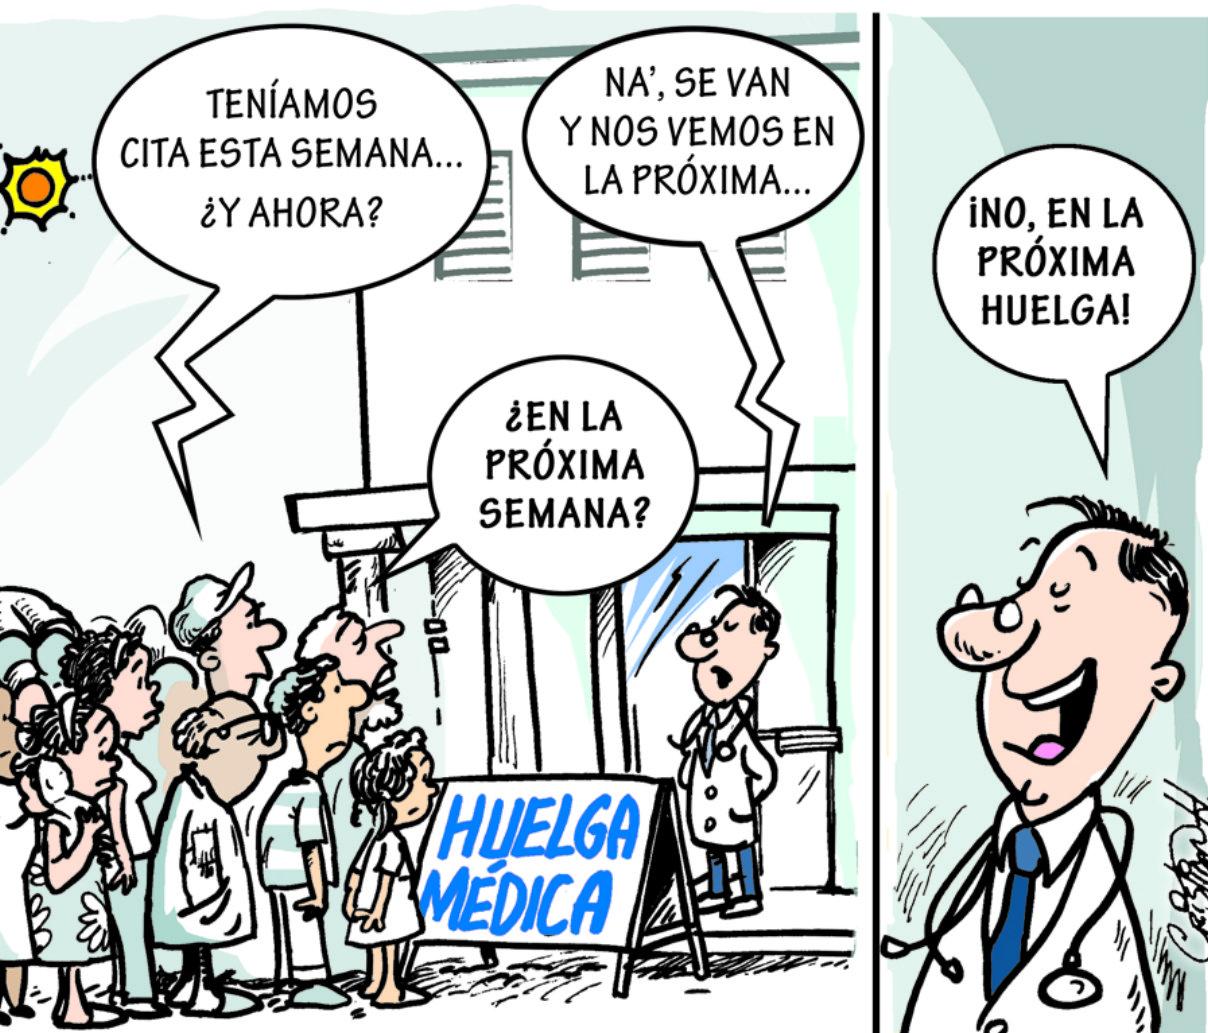 Caricatura El Día, Miércoles 18 de Octubre 2017